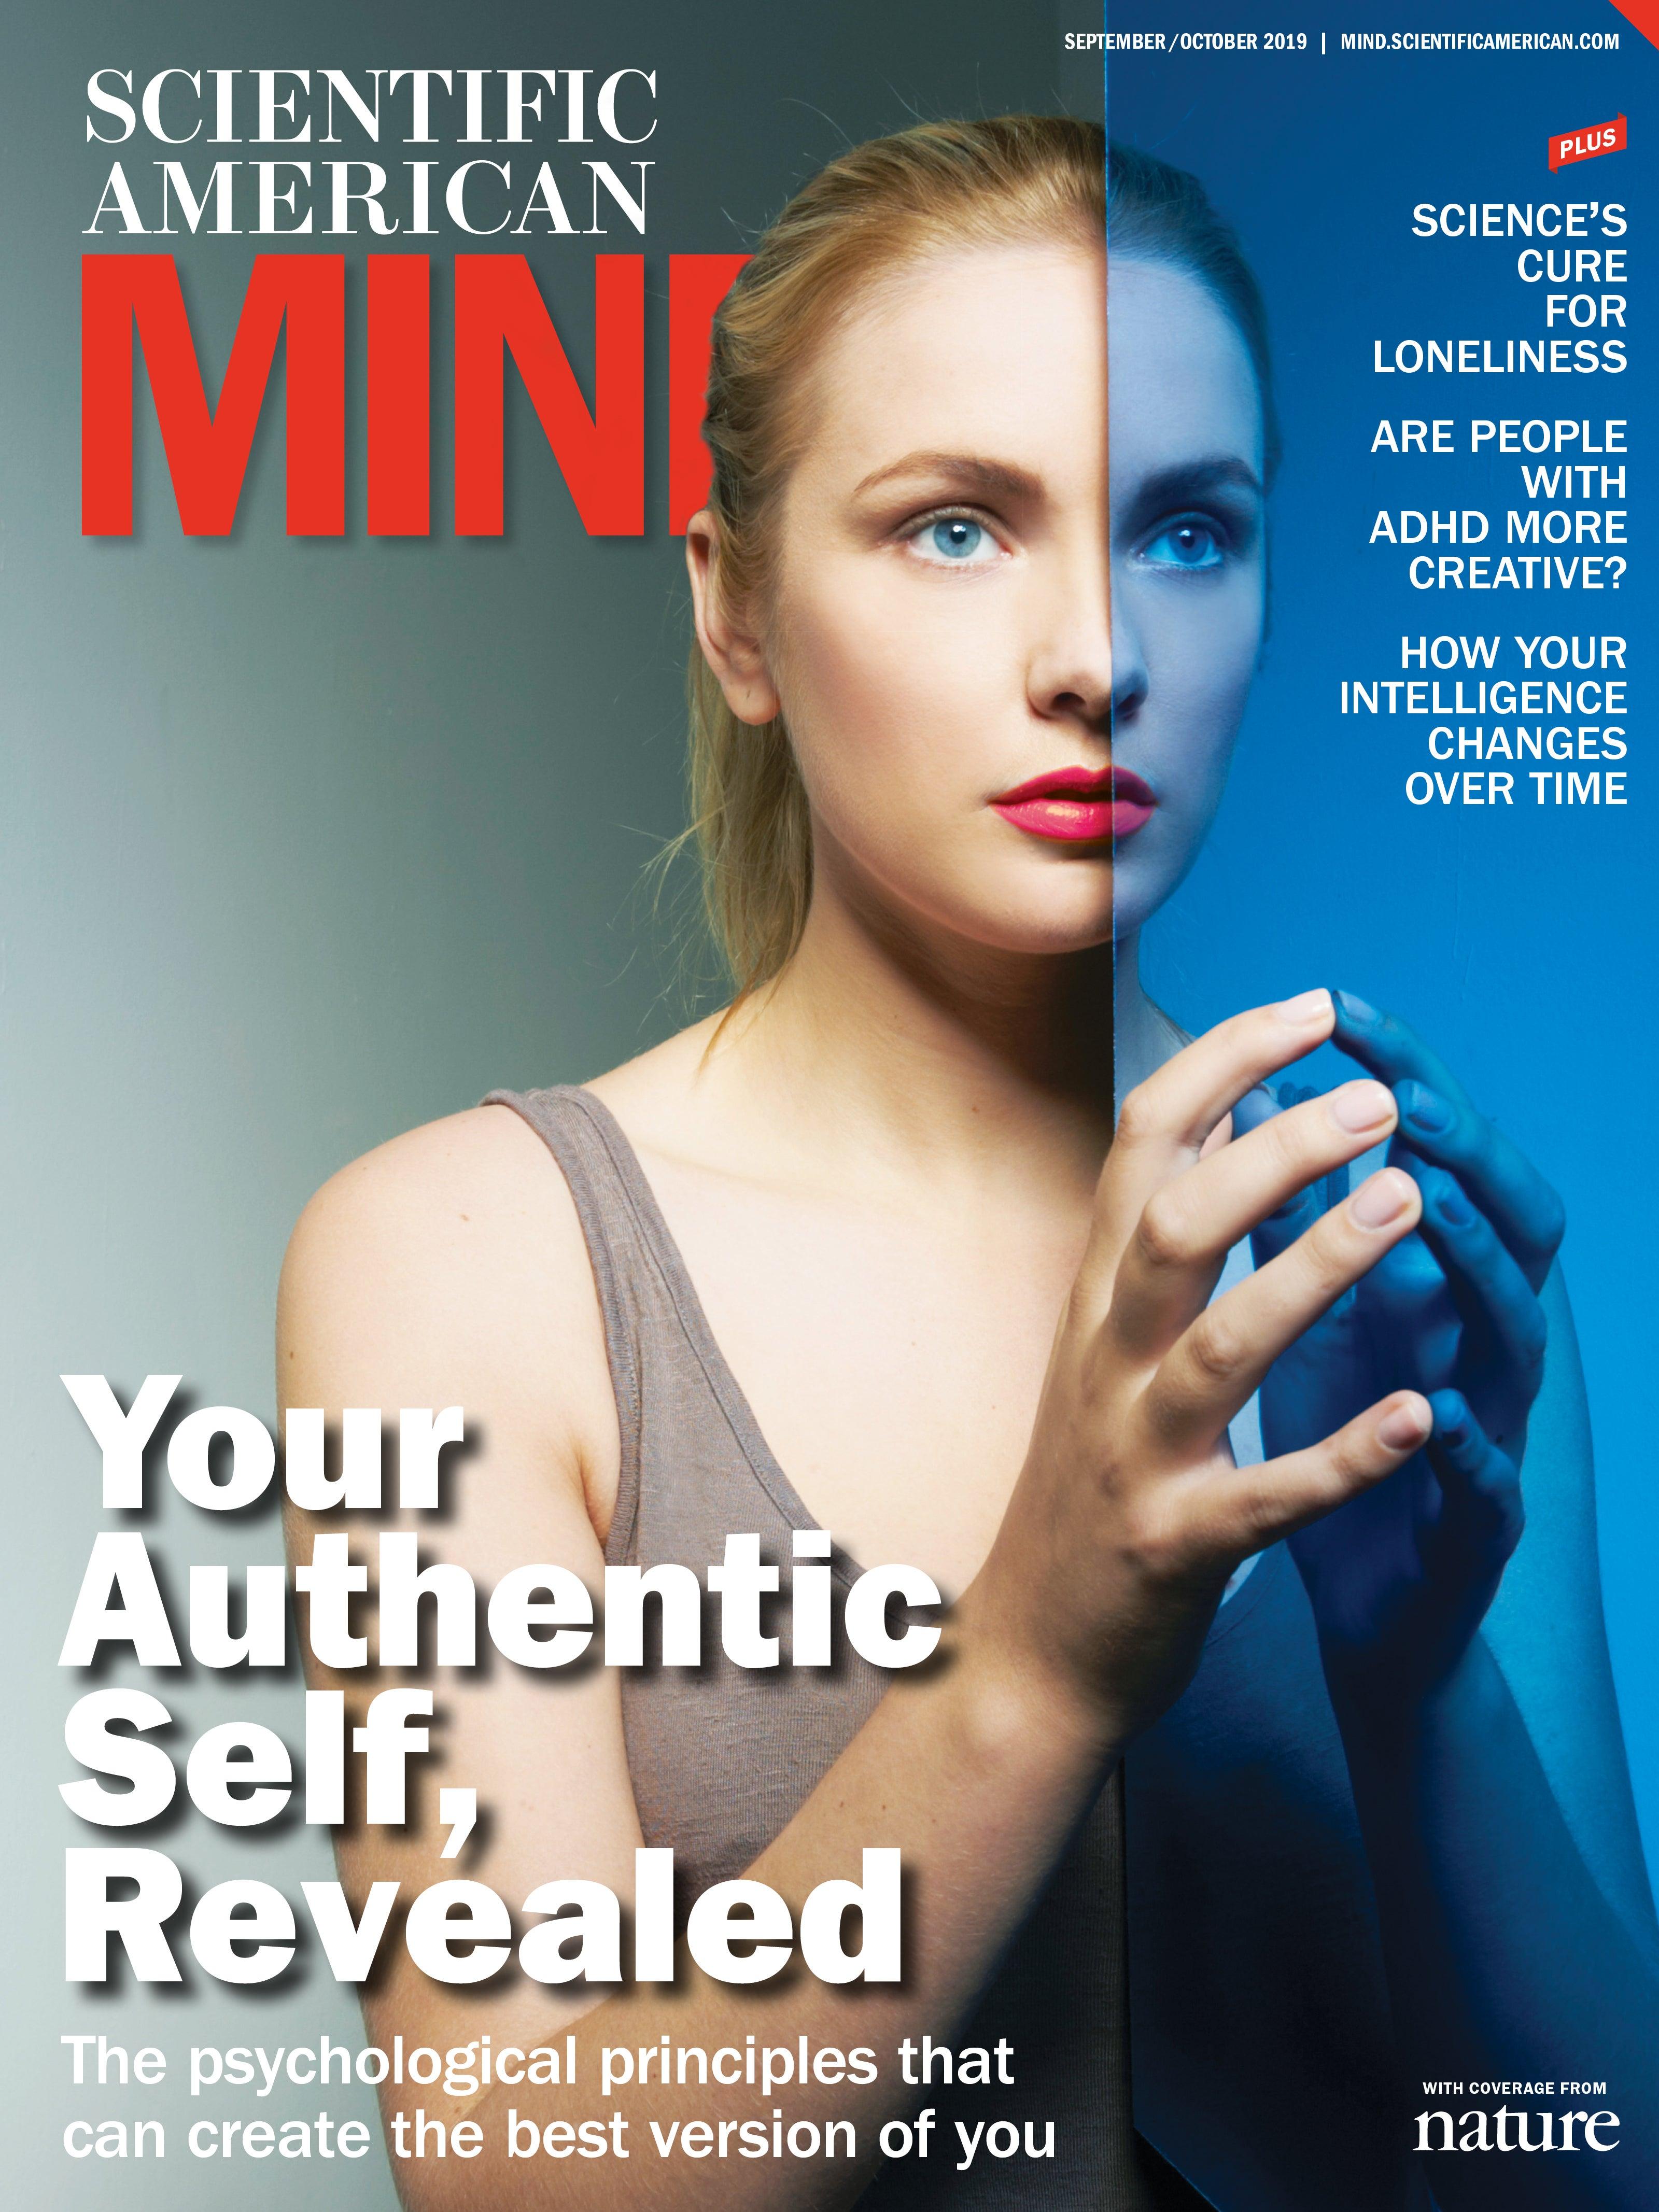 Scientific American Mind, Volume 30, Issue 5